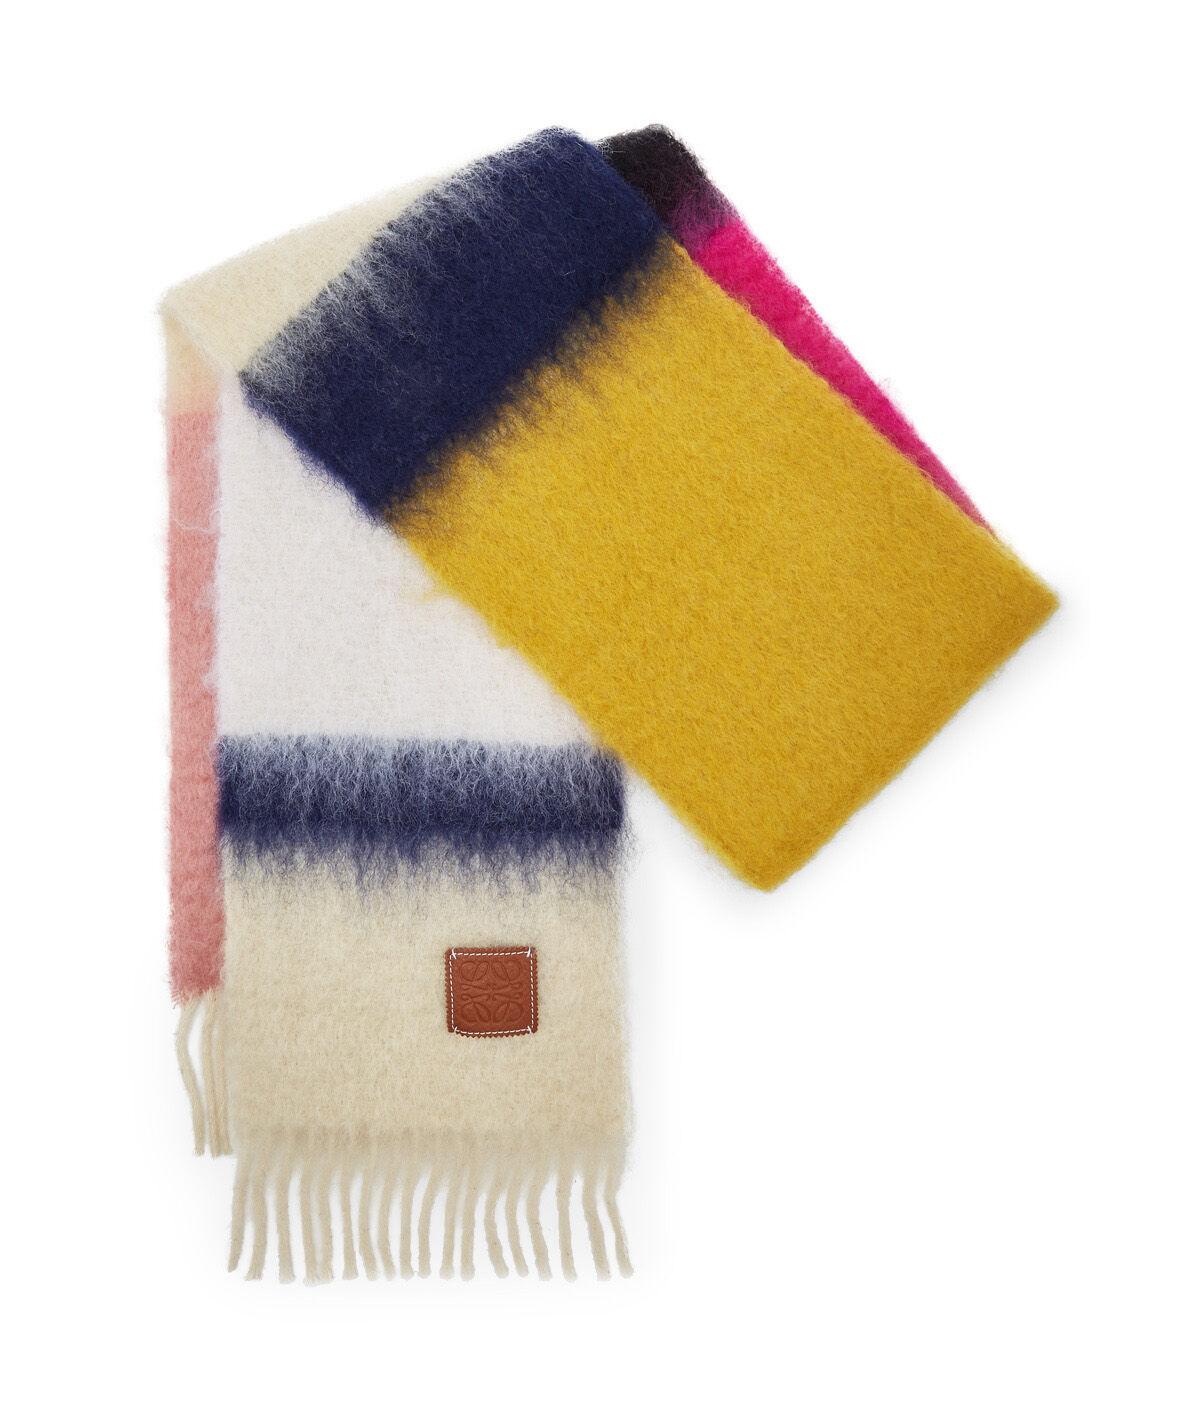 LOEWE 23X185 Scarf Stripes Rosa/Negro all